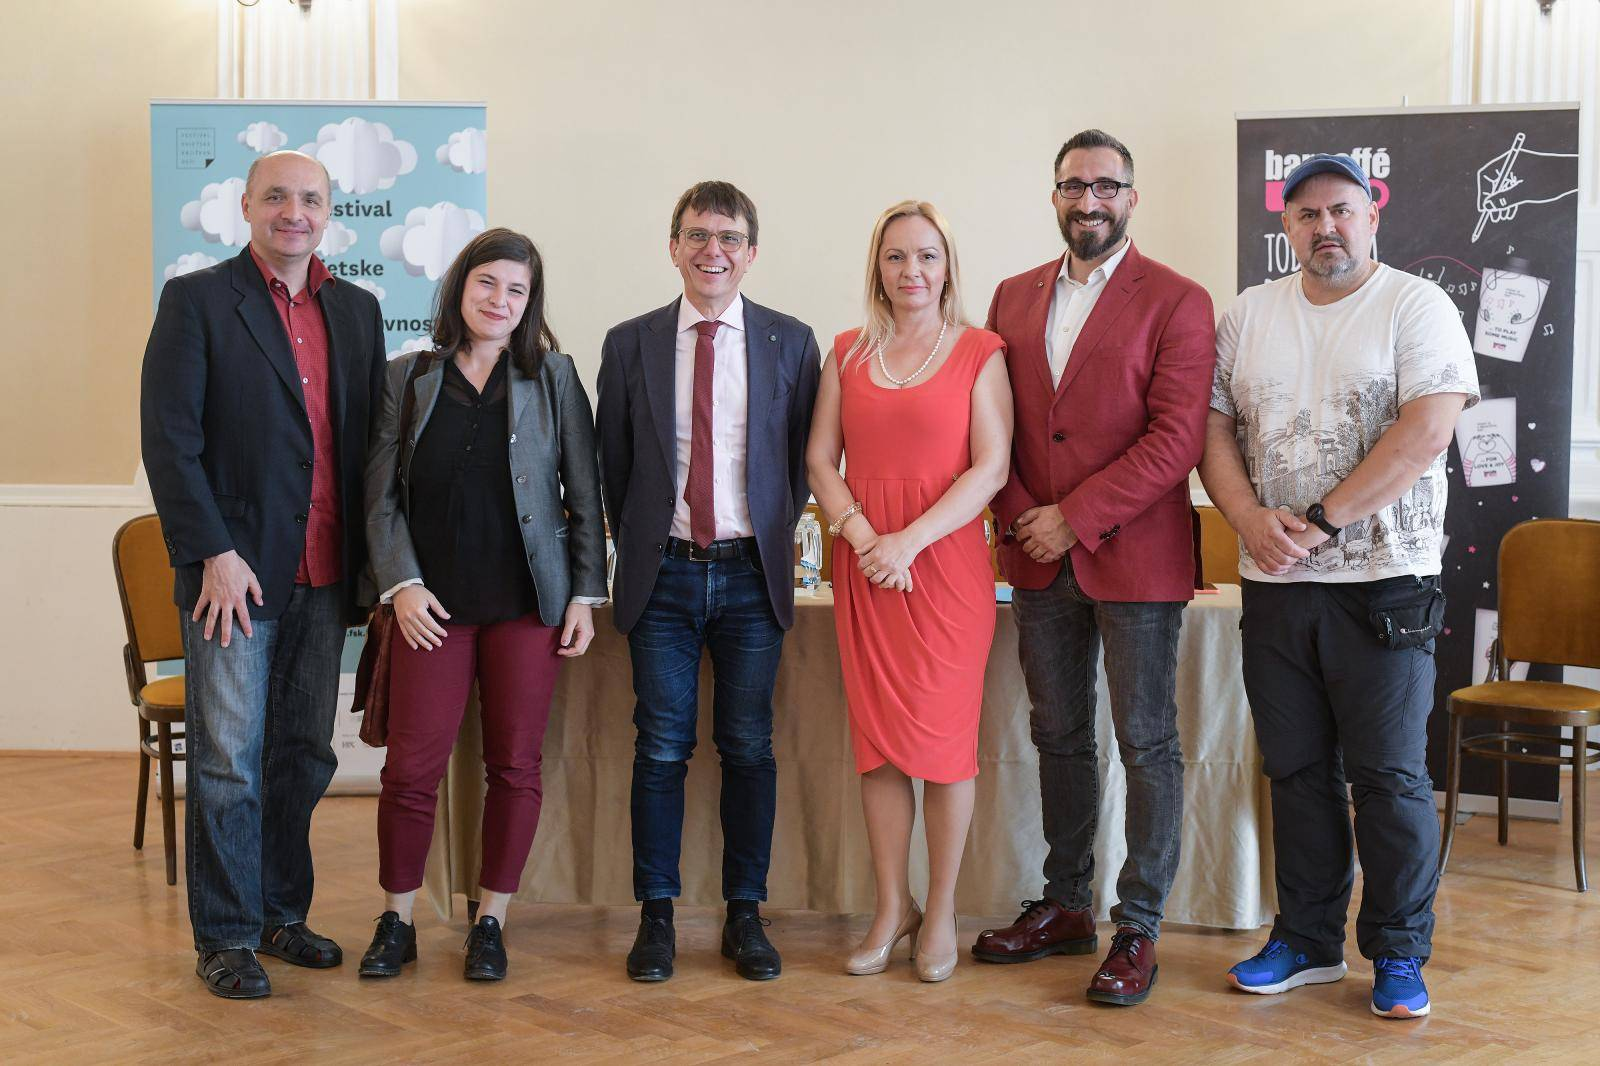 Festival svjetske književnosti najavljen je za rujan u HGZ-u